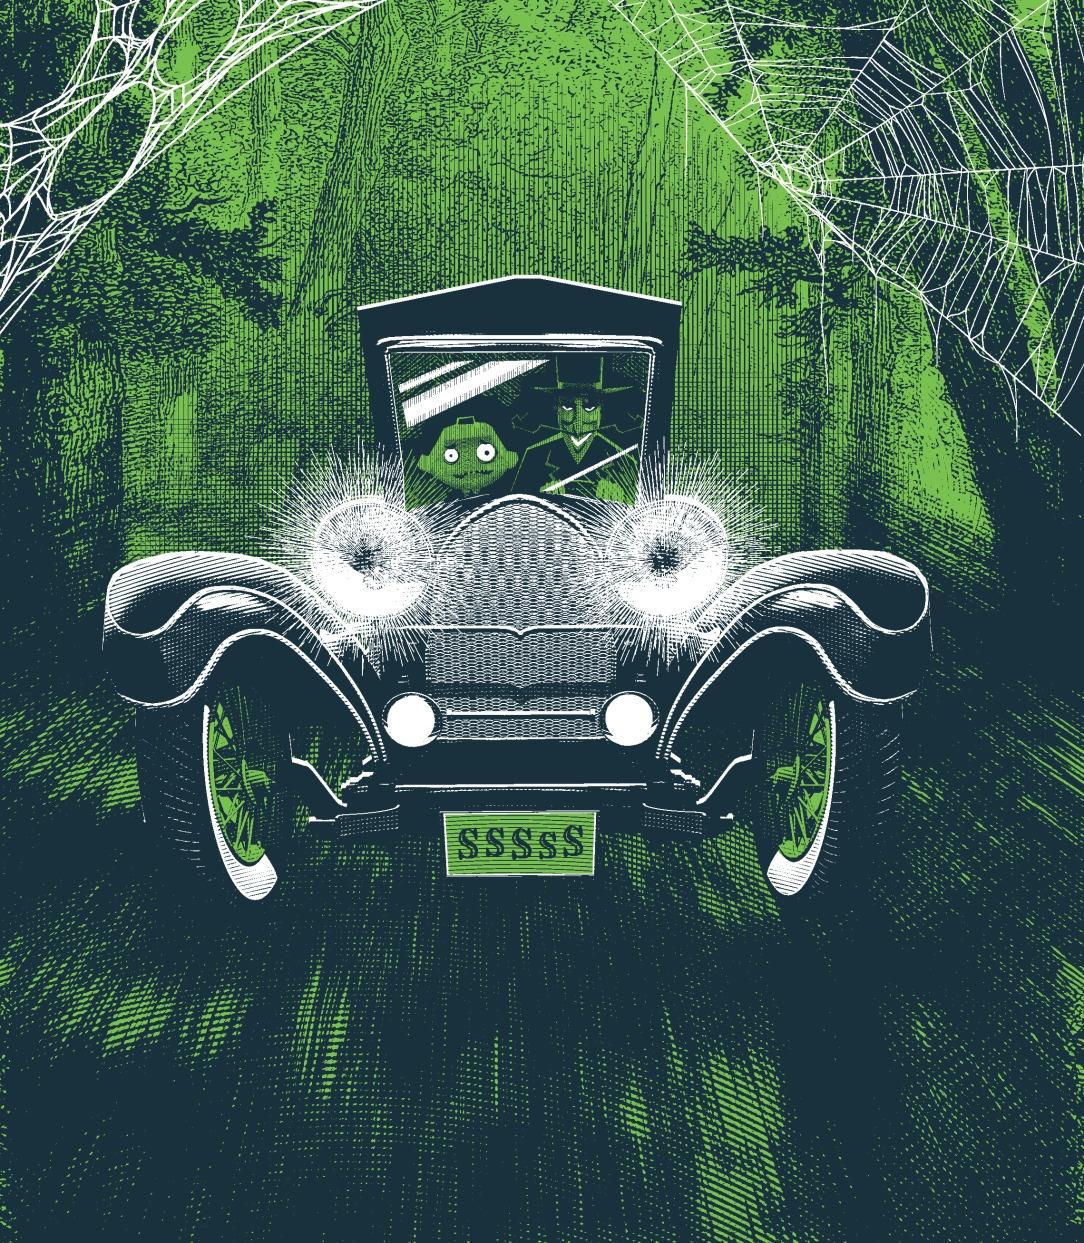 barb-warren-whispering-woods-p99